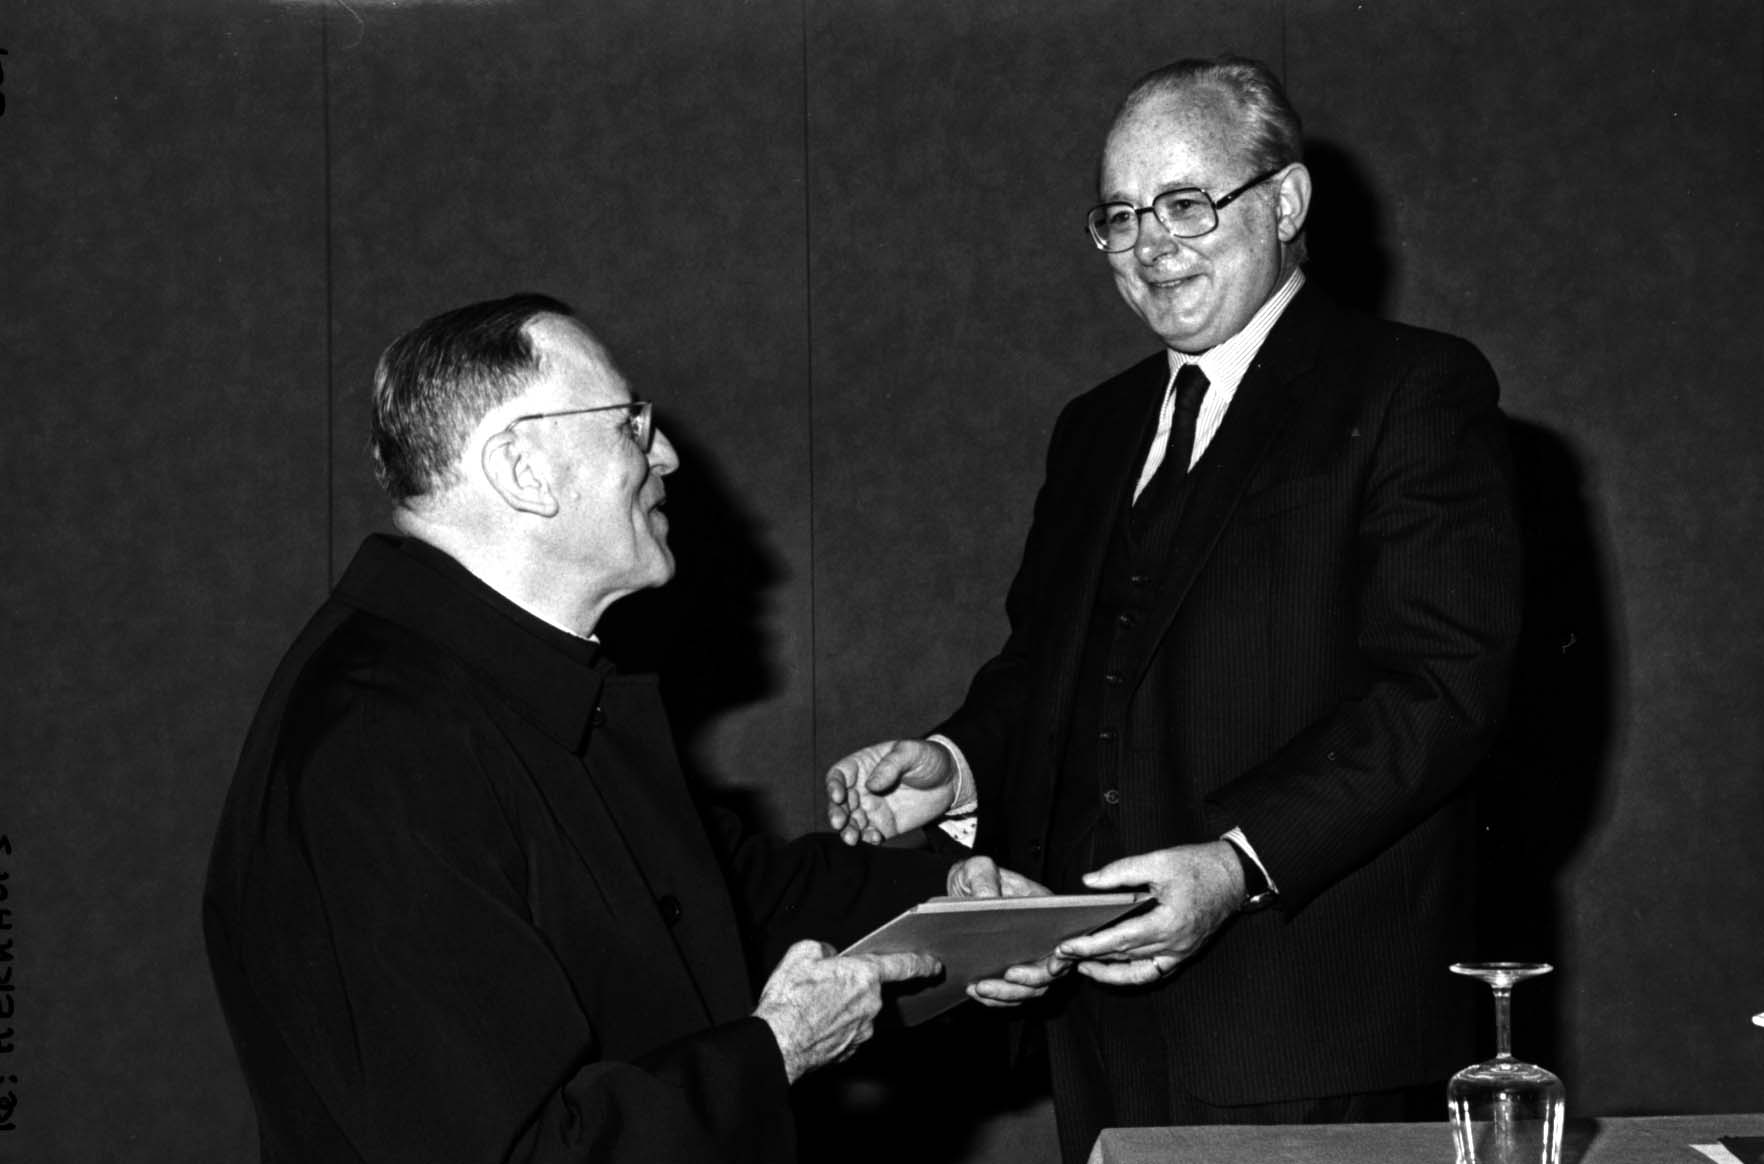 Ceremony in honor of Louis Kerkhofs.